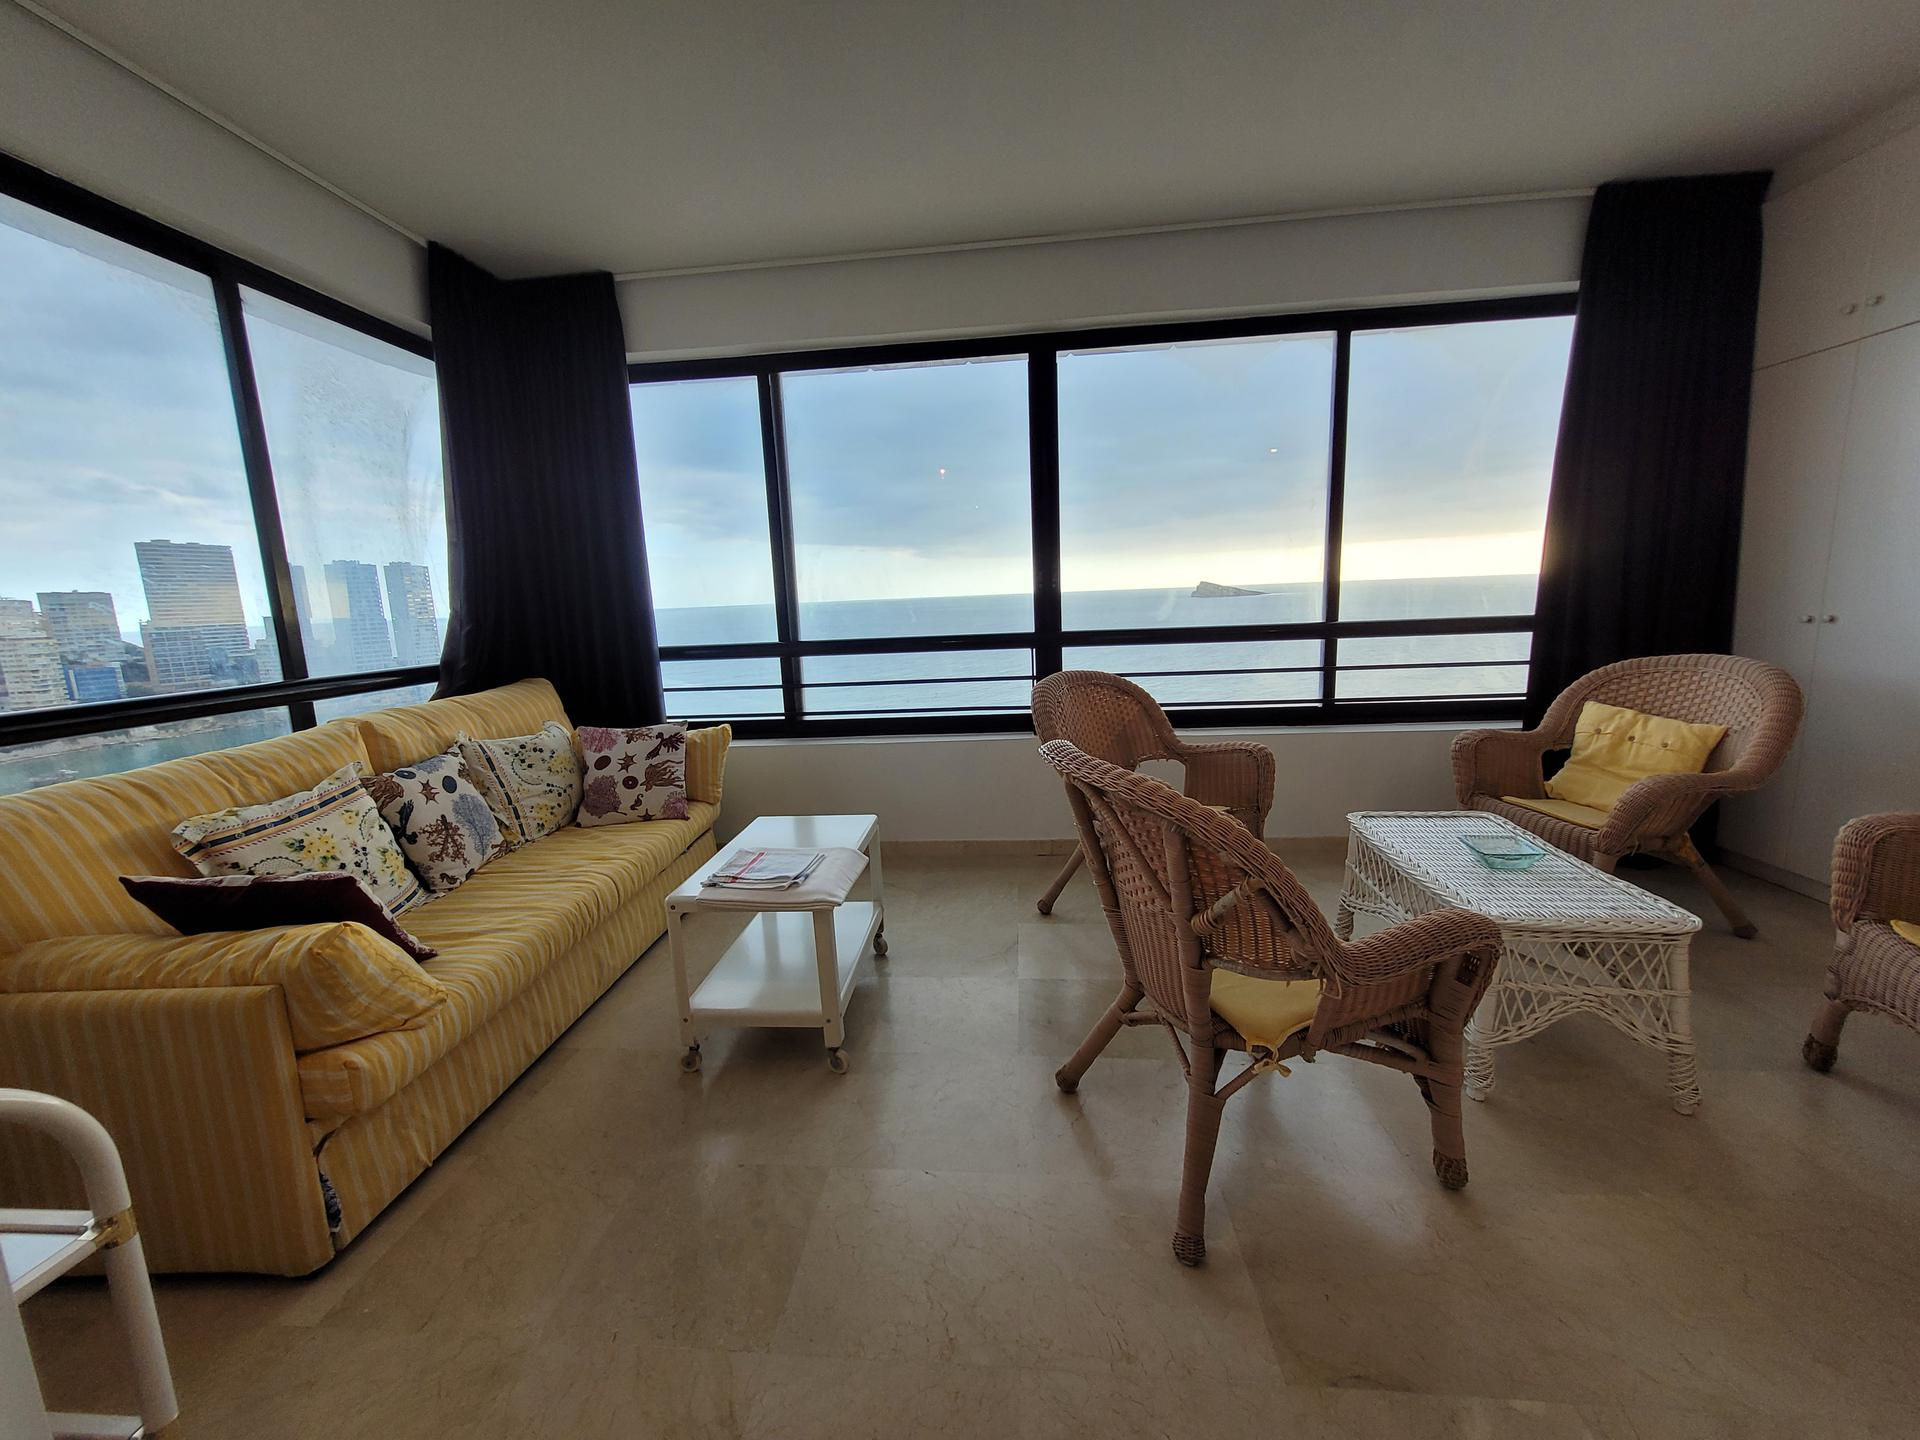 Apartamento -                                       Benidorm -                                       1 dormitorios -                                       0 ocupantes